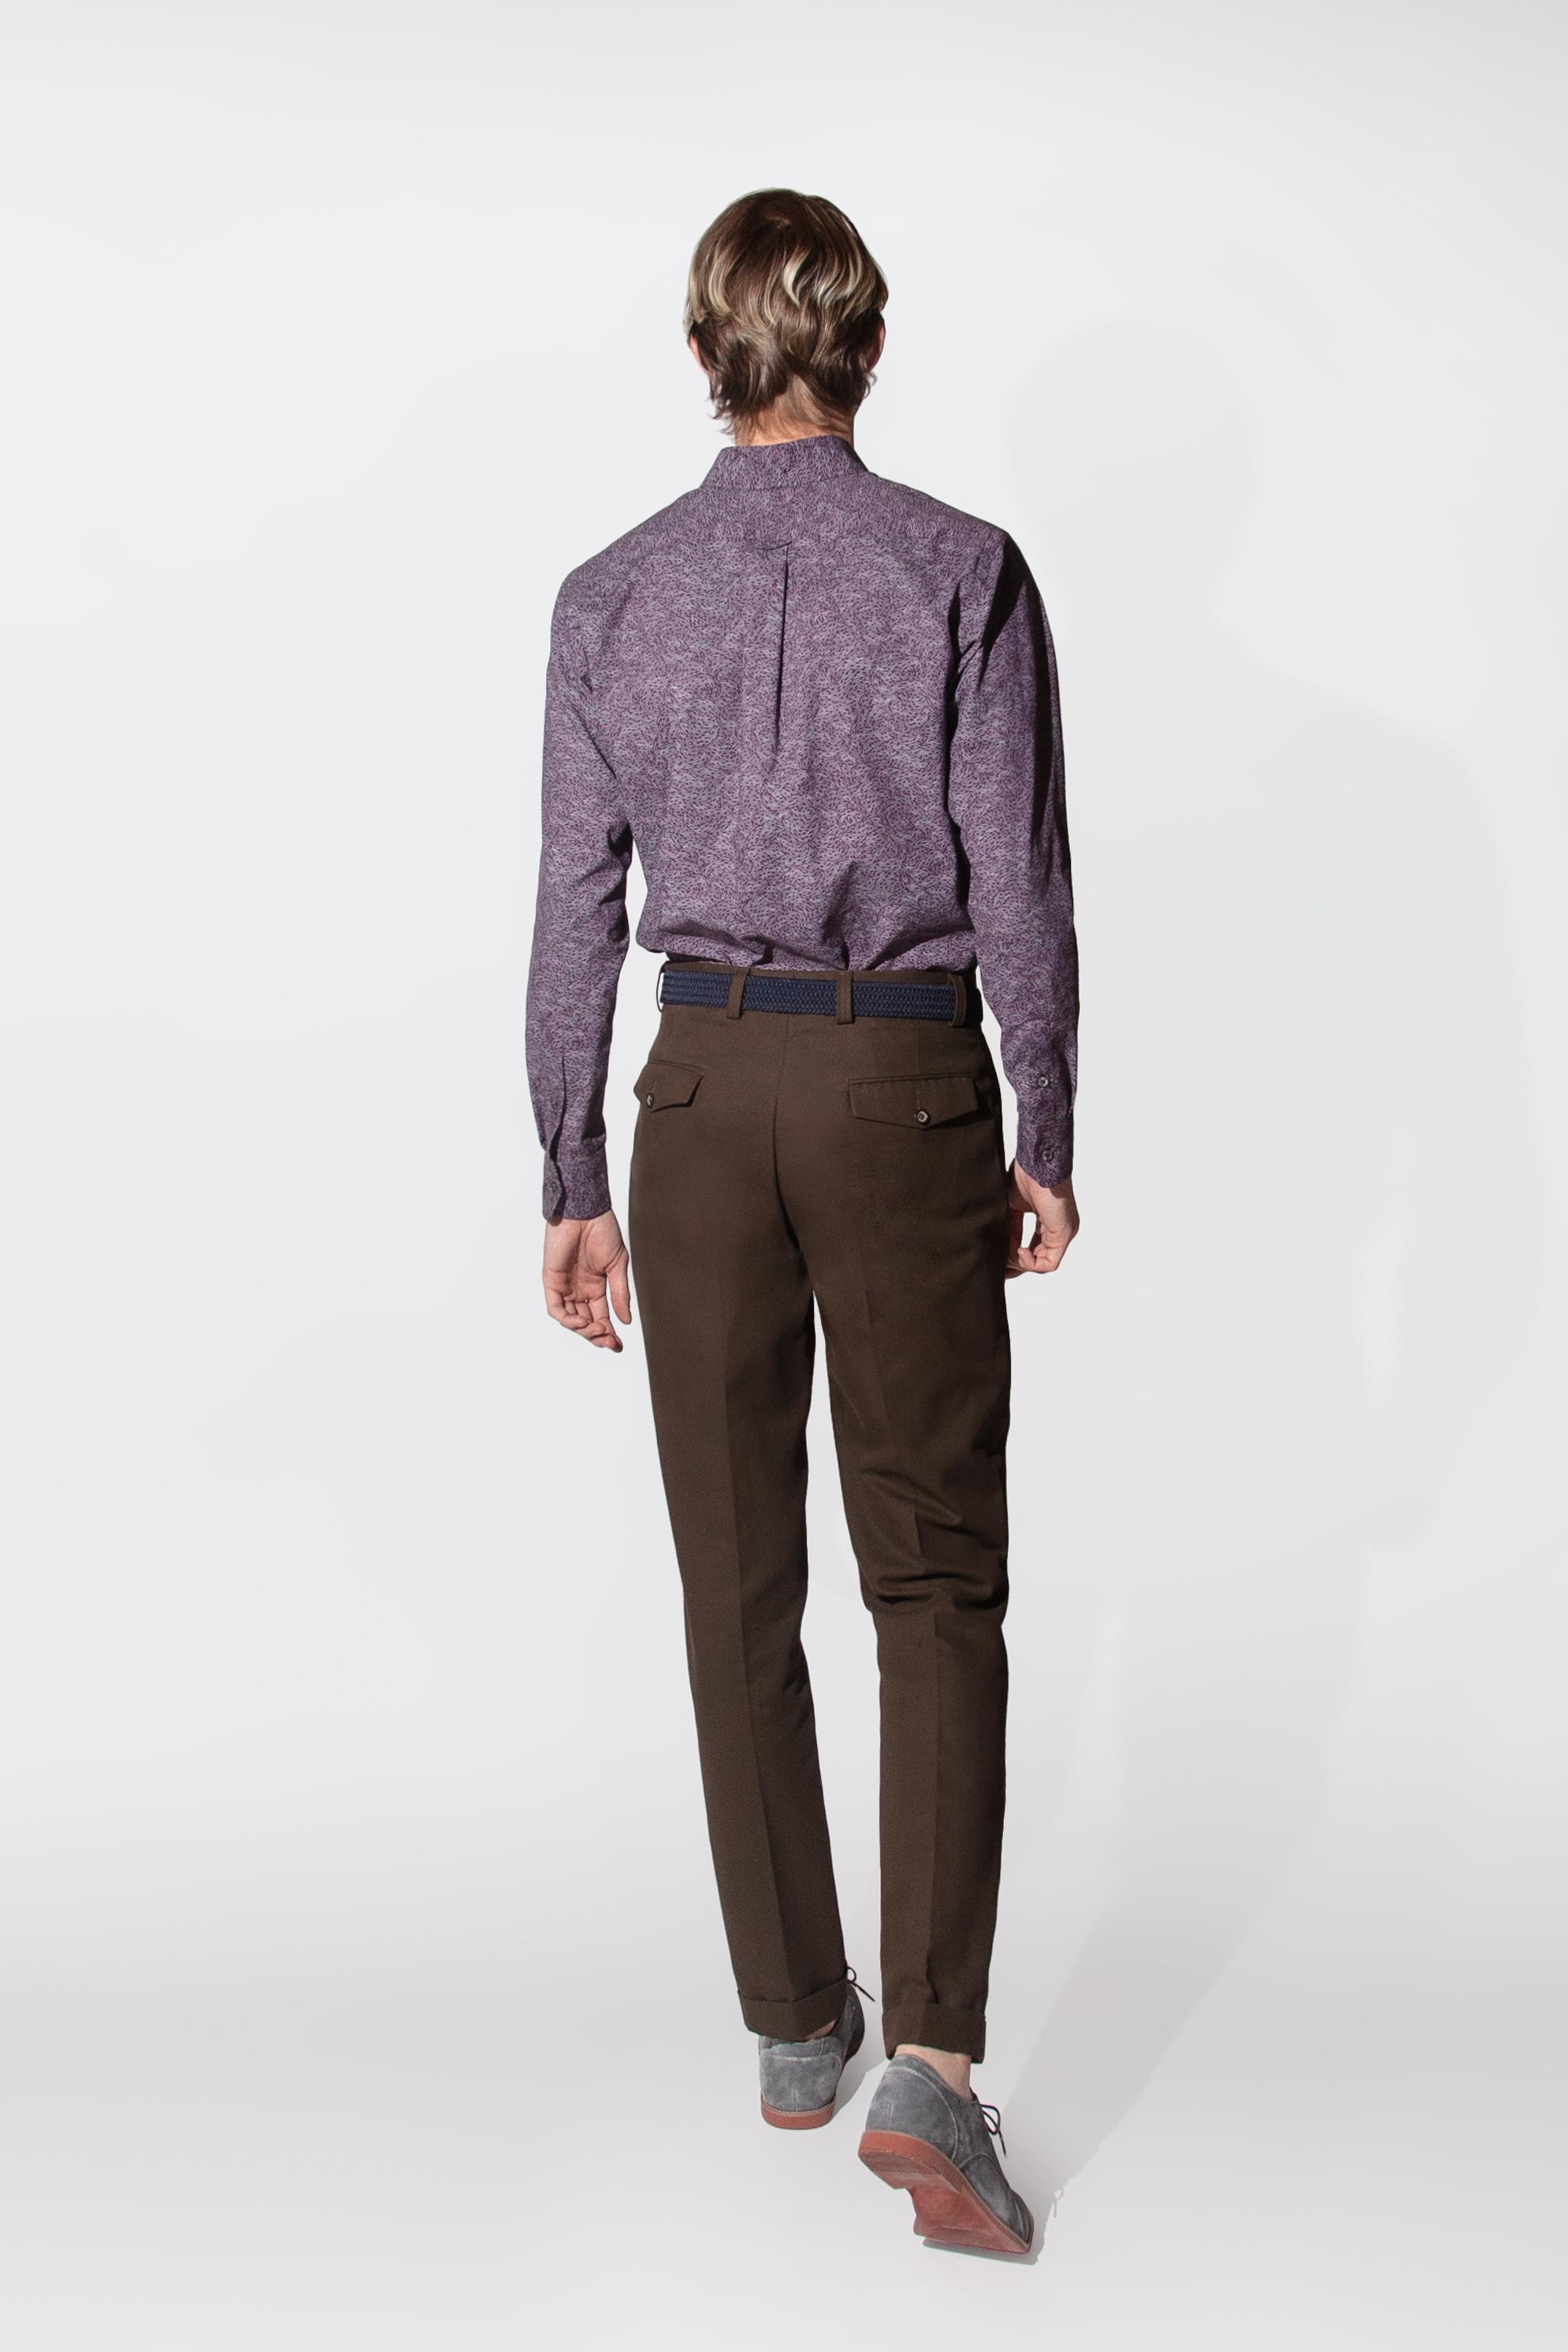 cotton twill trouser $225